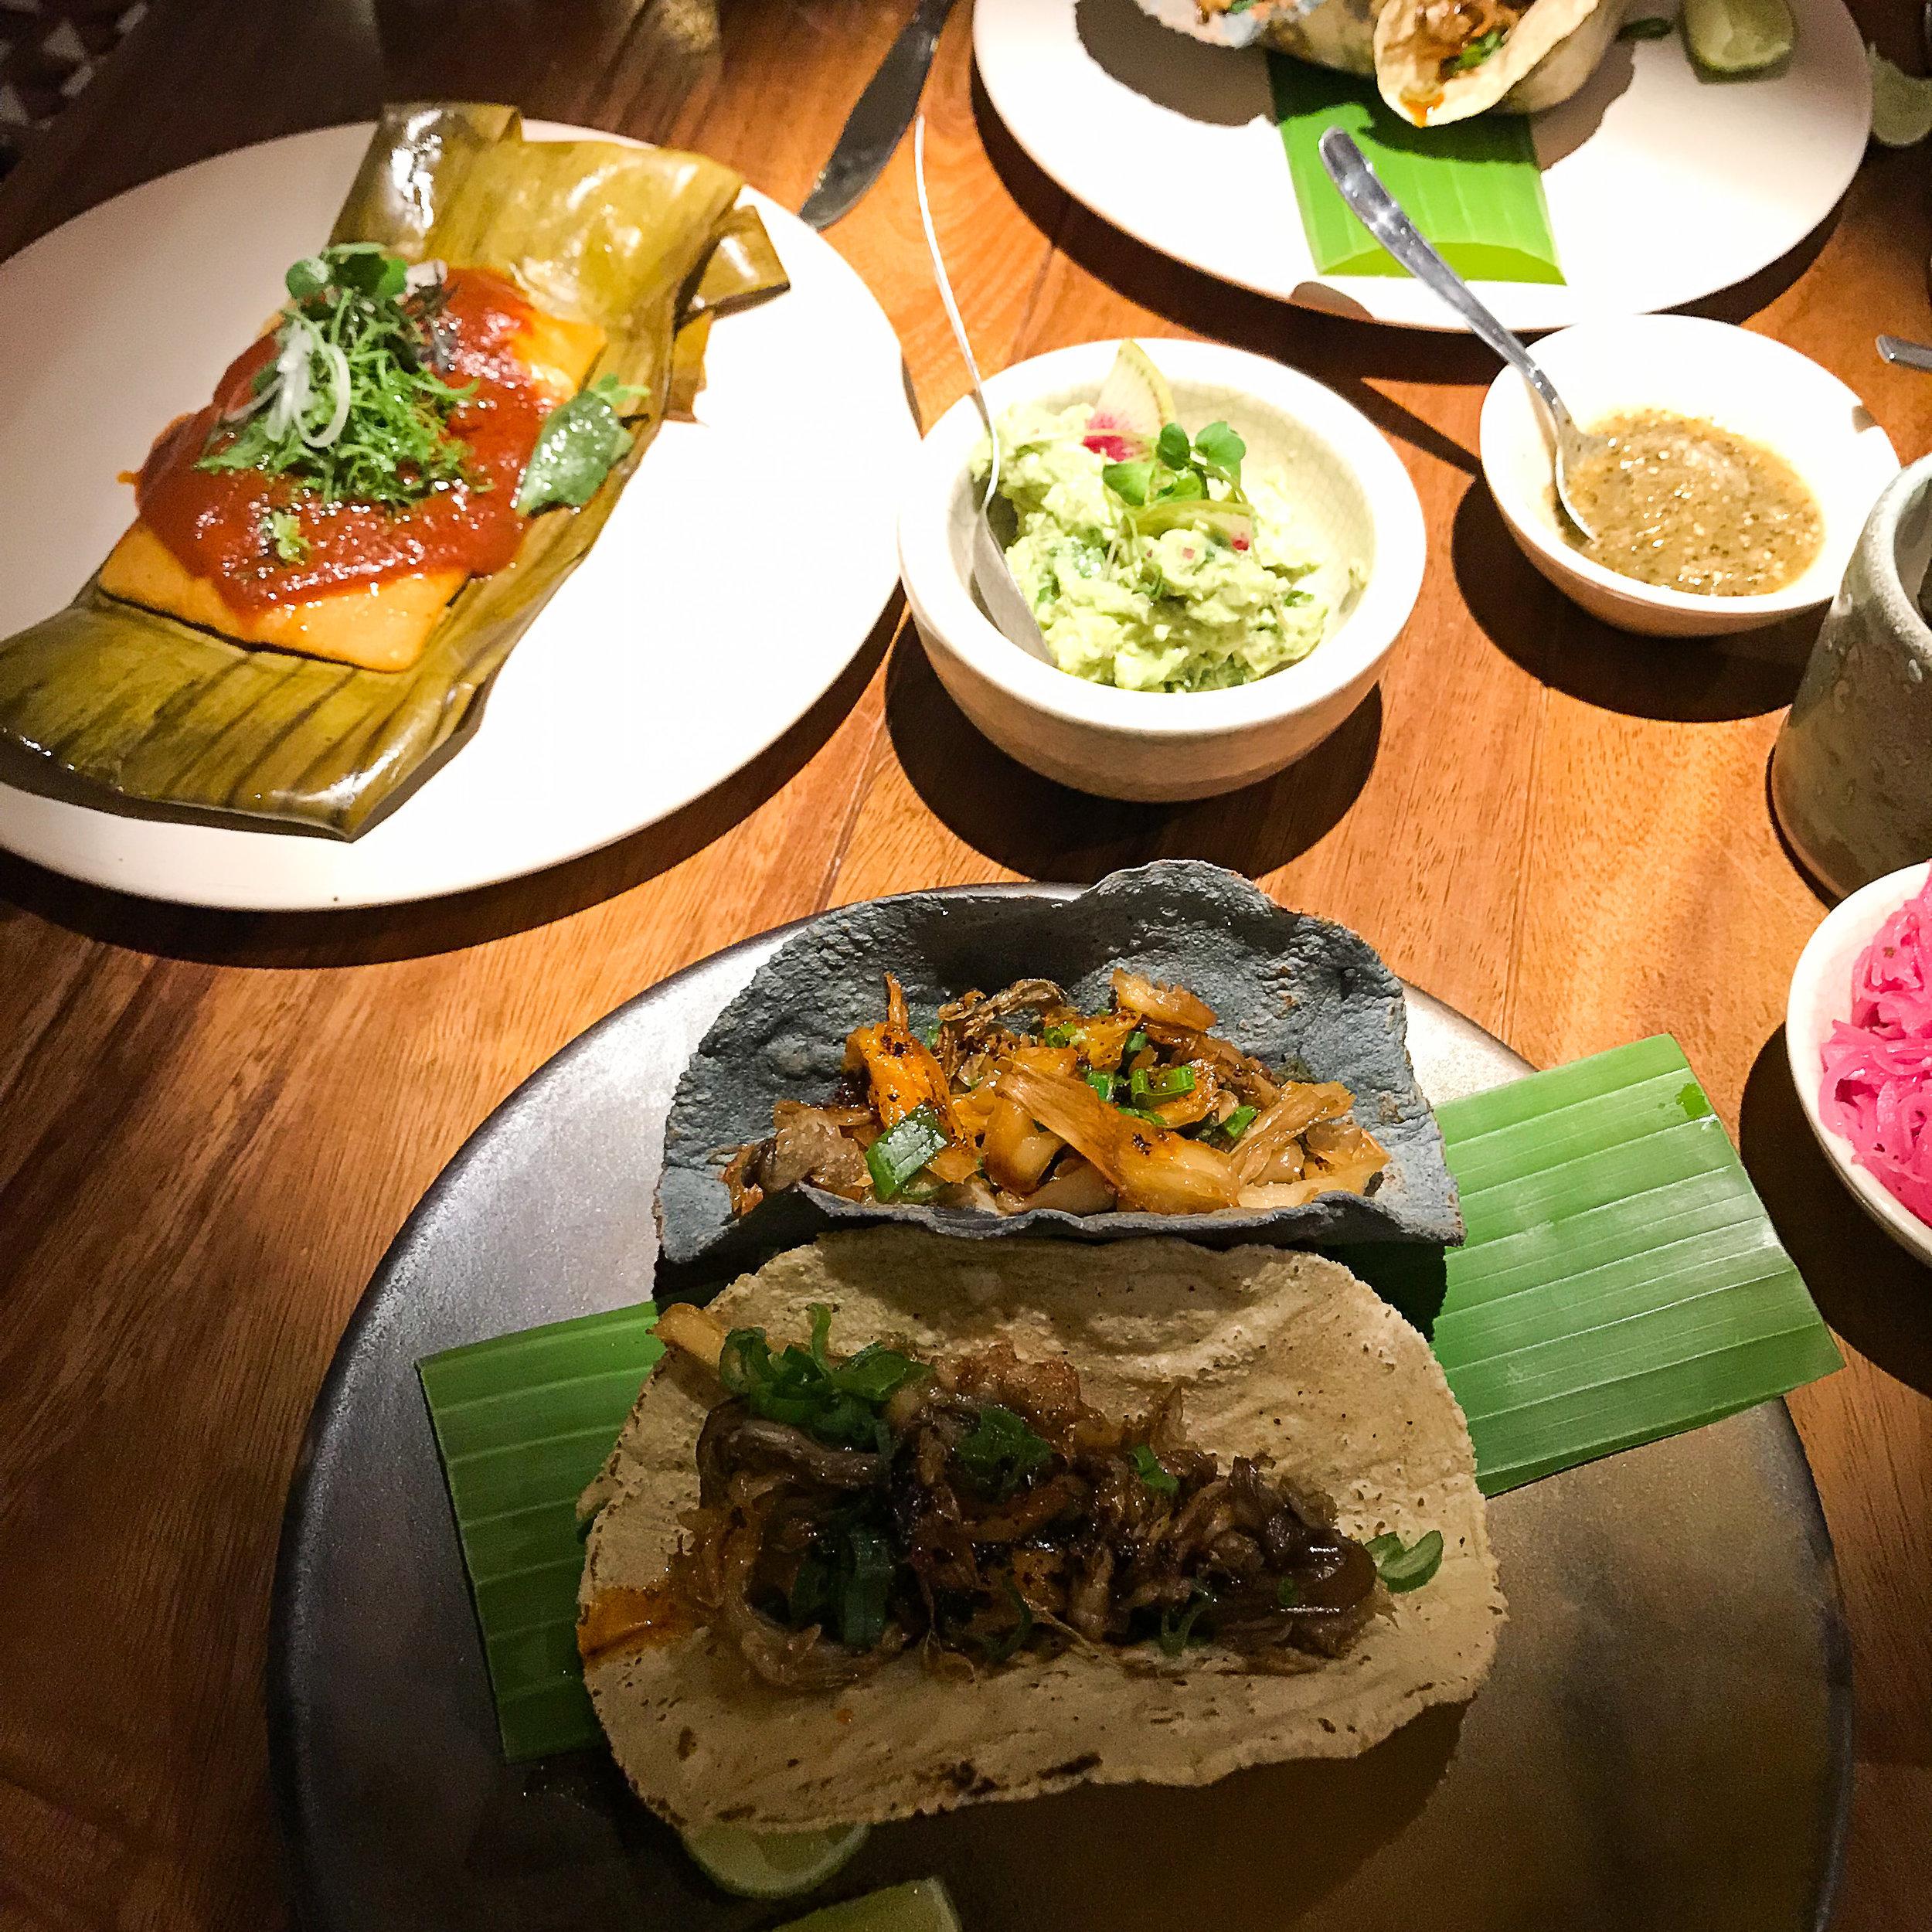 mexican-food-san-miguel-de-allende-restuarants-coffee-cafes-21.jpg